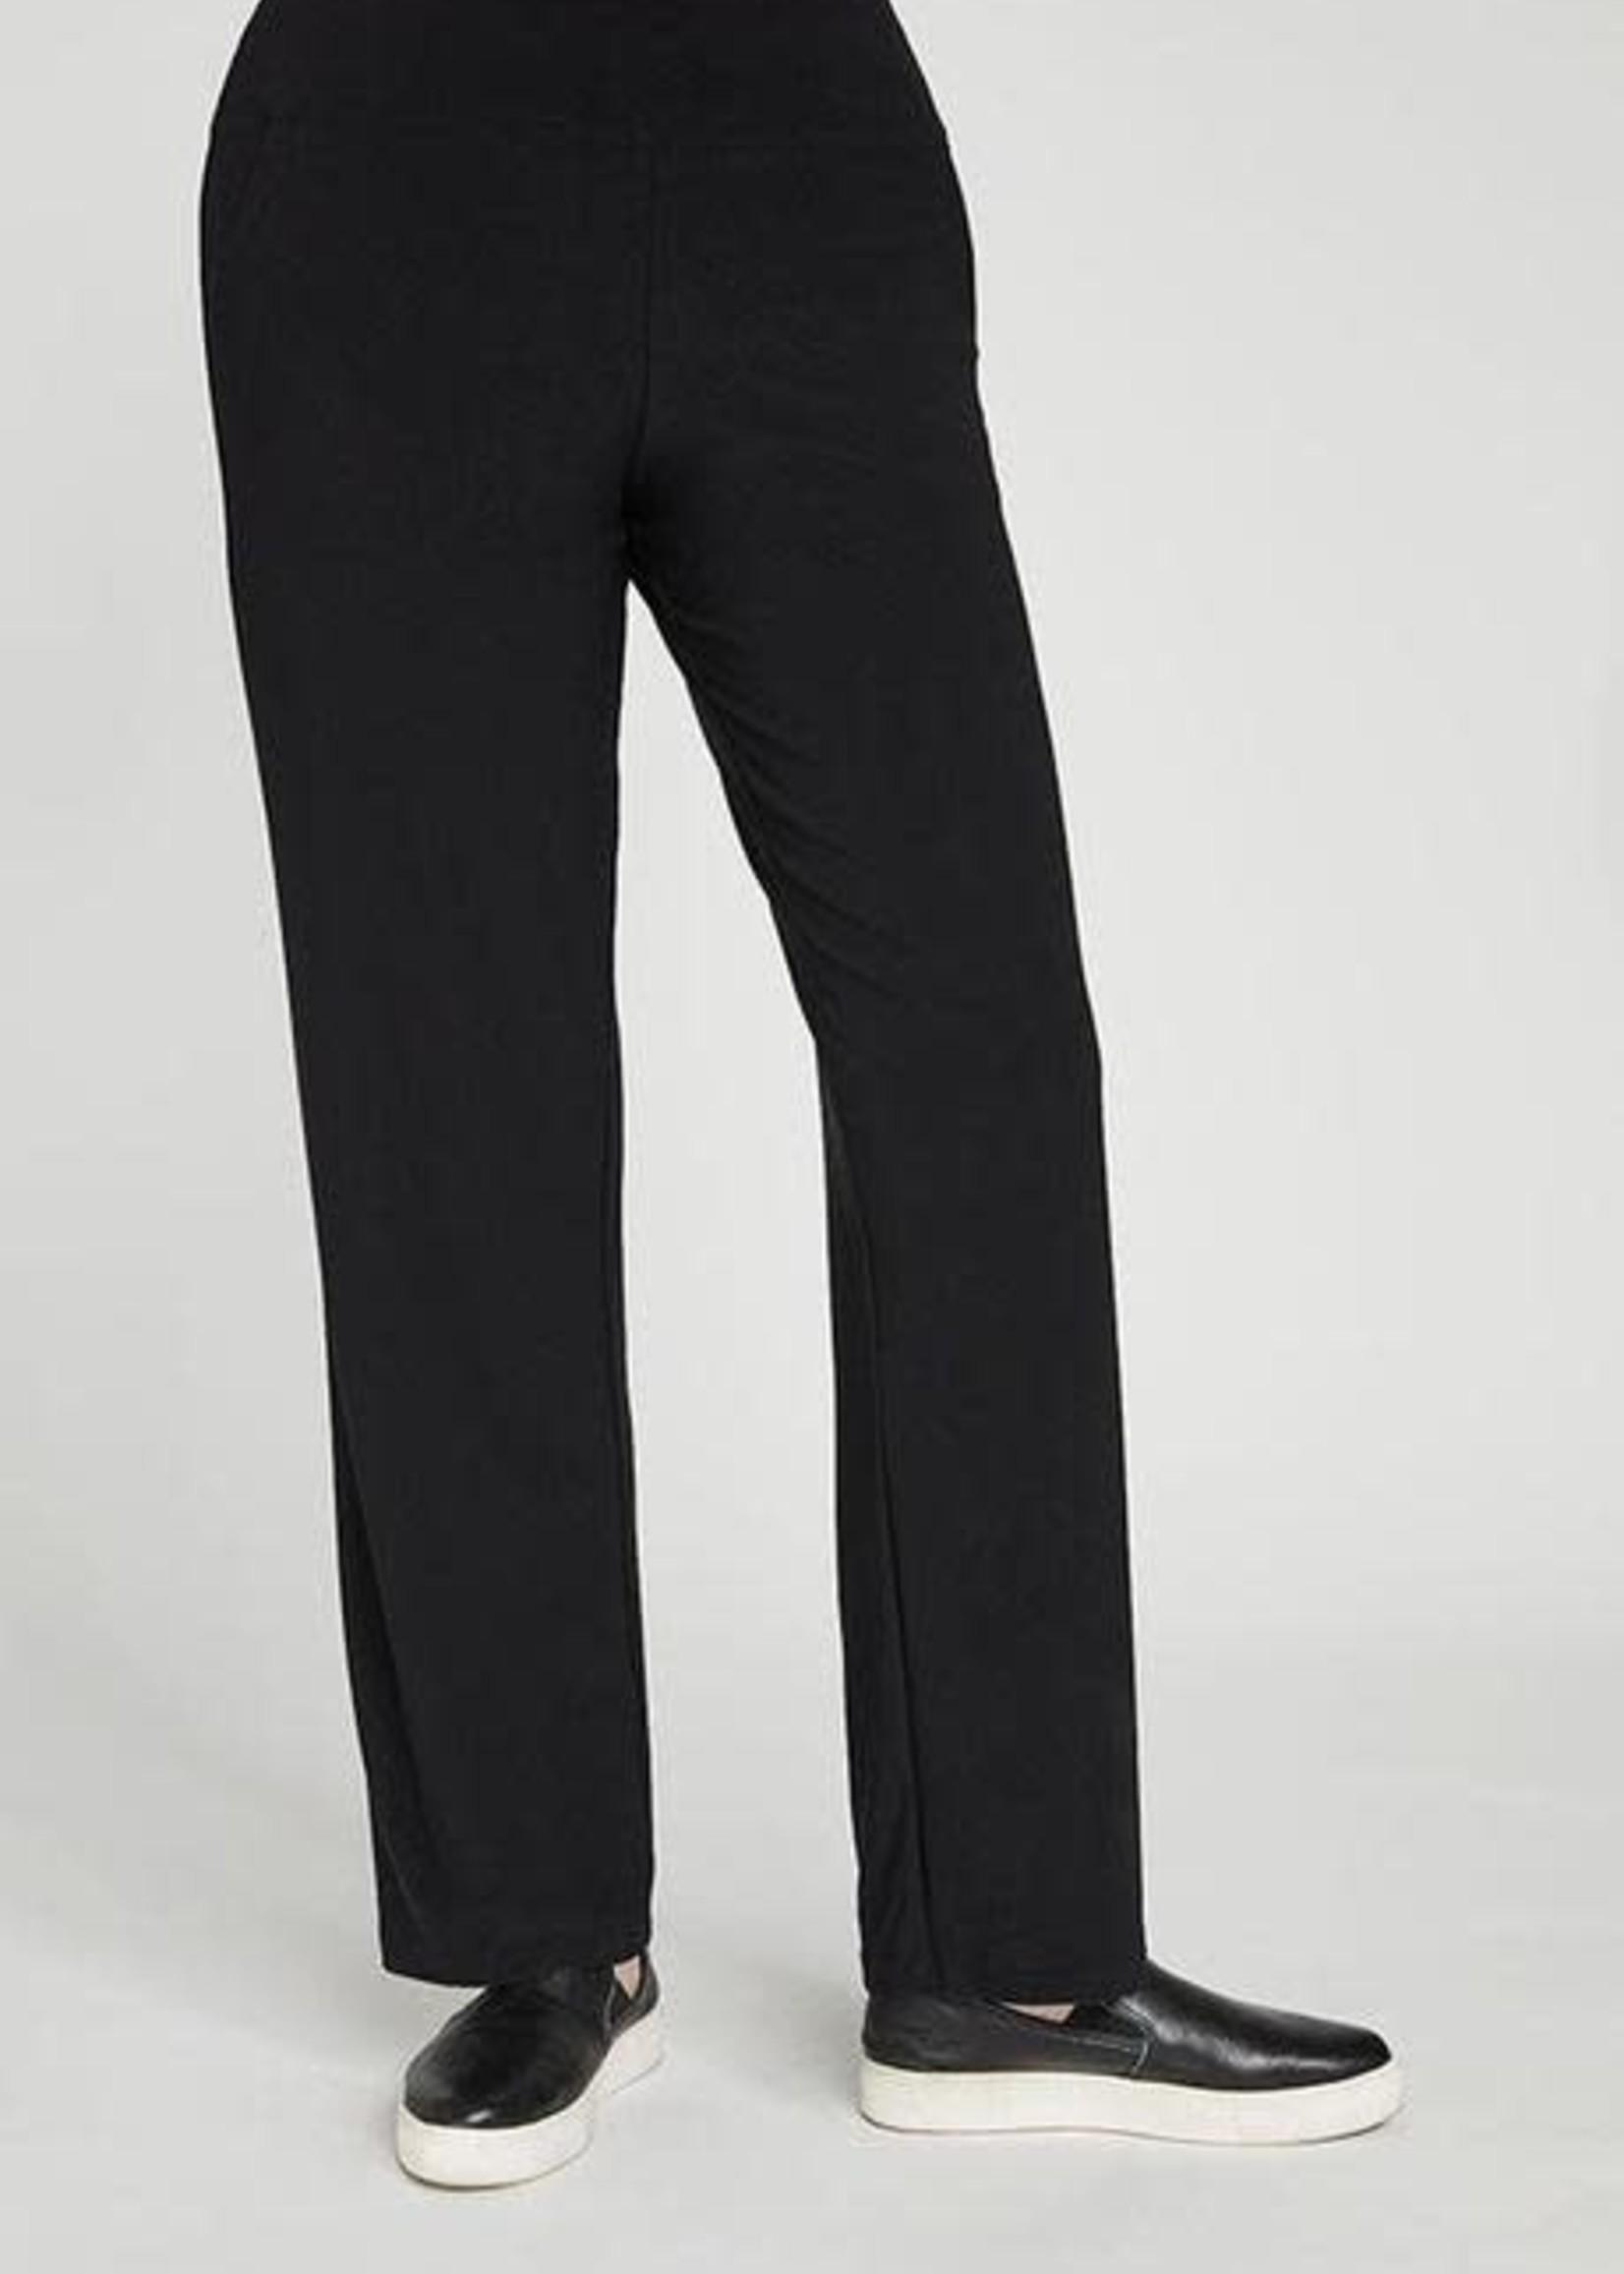 Sympli Sympli Straight Leg Pants